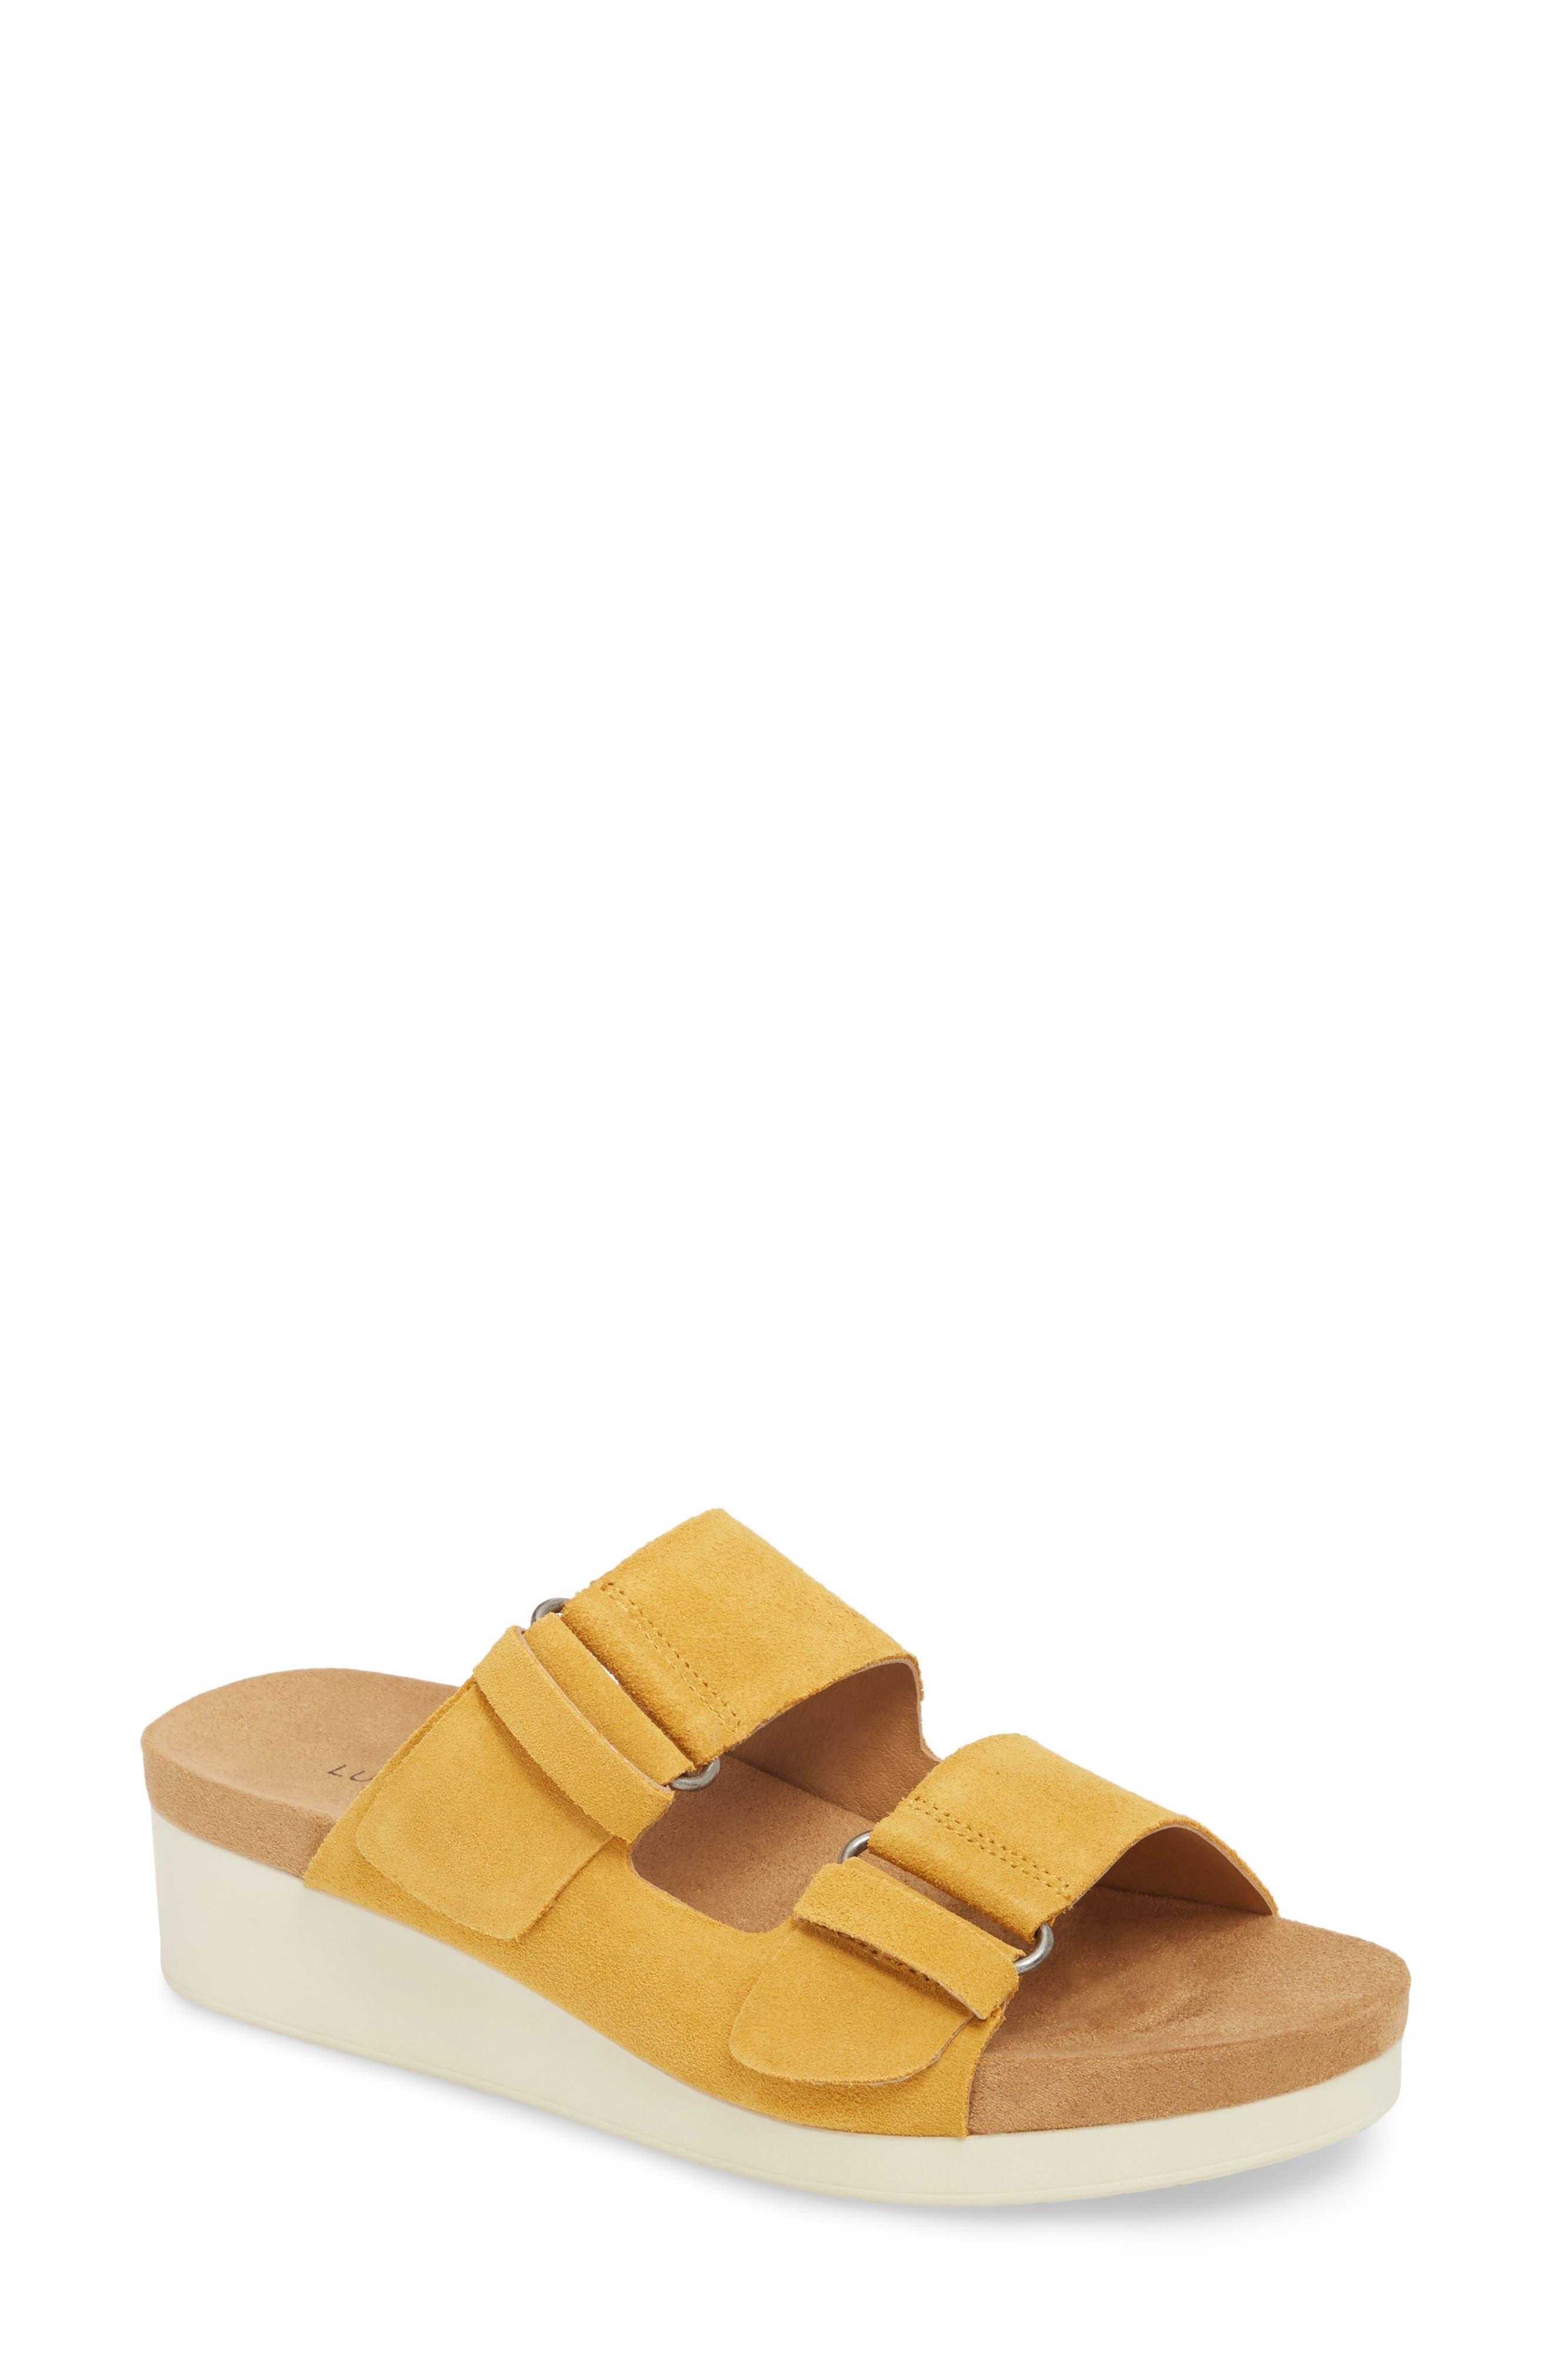 Feniya Sandal,                         Main,                         color, Saffron Suede